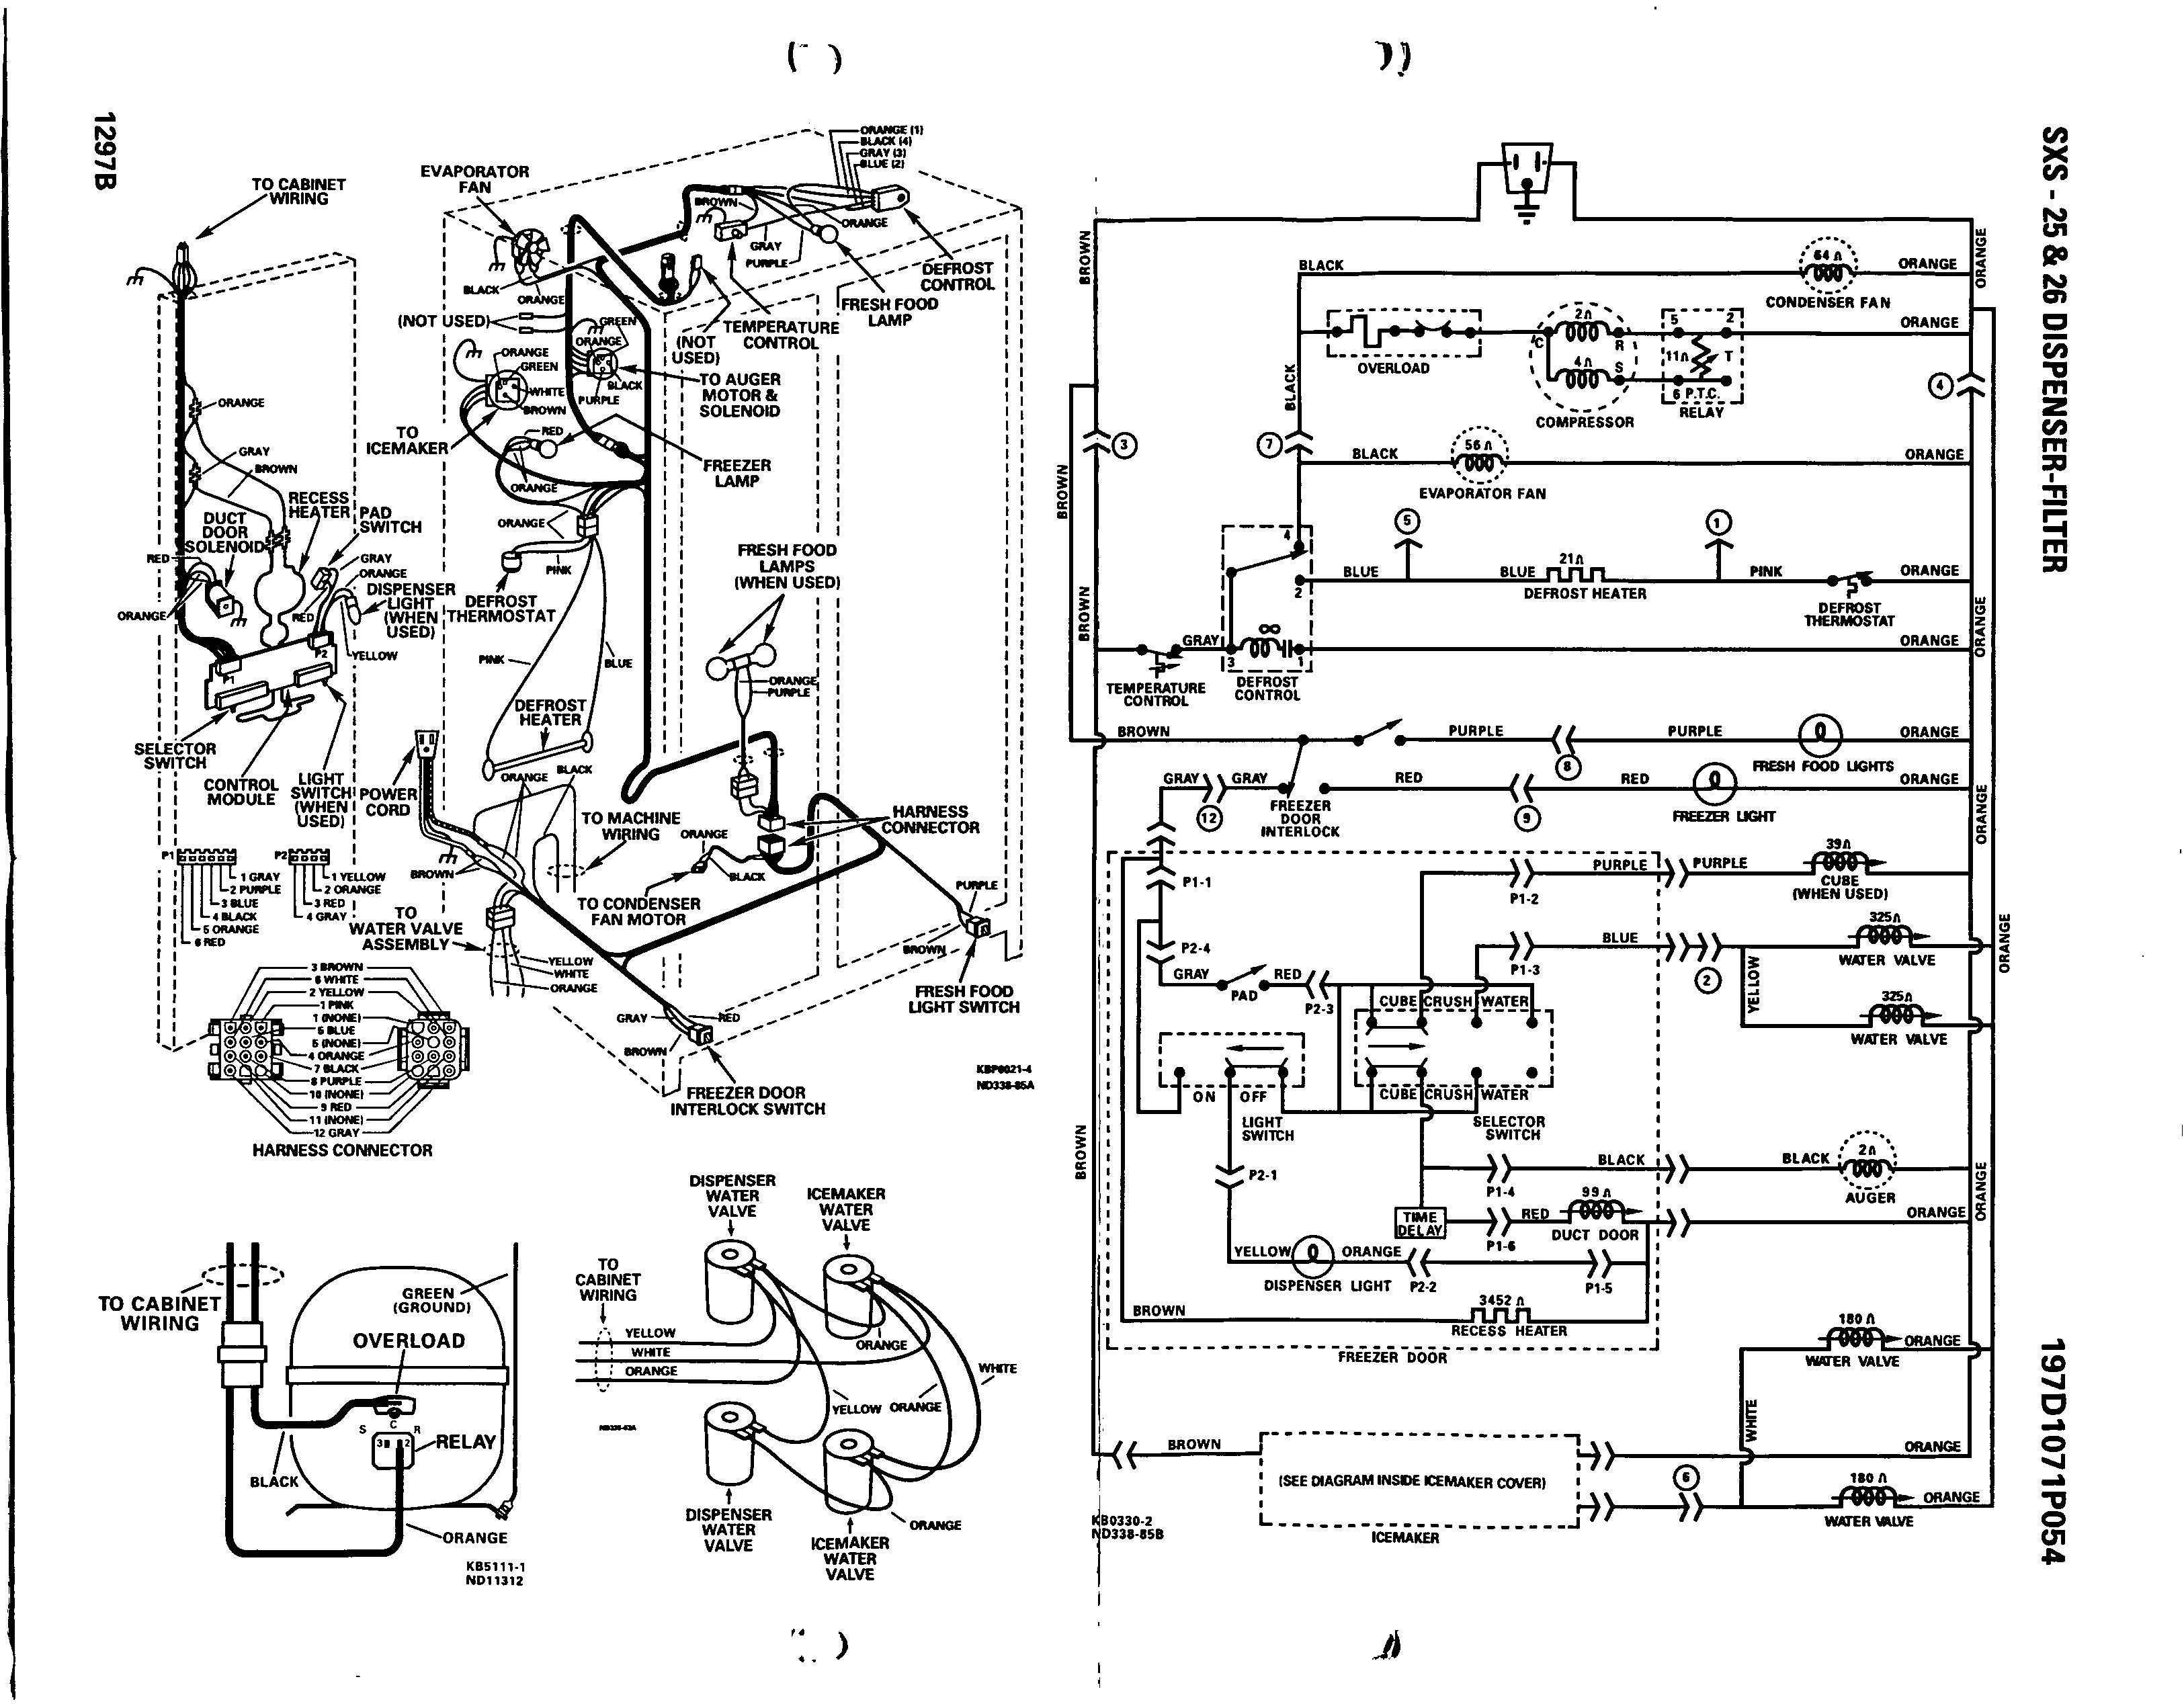 Whirlpool Refrigerator Wiring Diagram Copy Defrost Timer Wiring Whirlpool Refrigerator Wiring Diagram Fresh Diagrams Define Pics Whirlpool Refrigerator